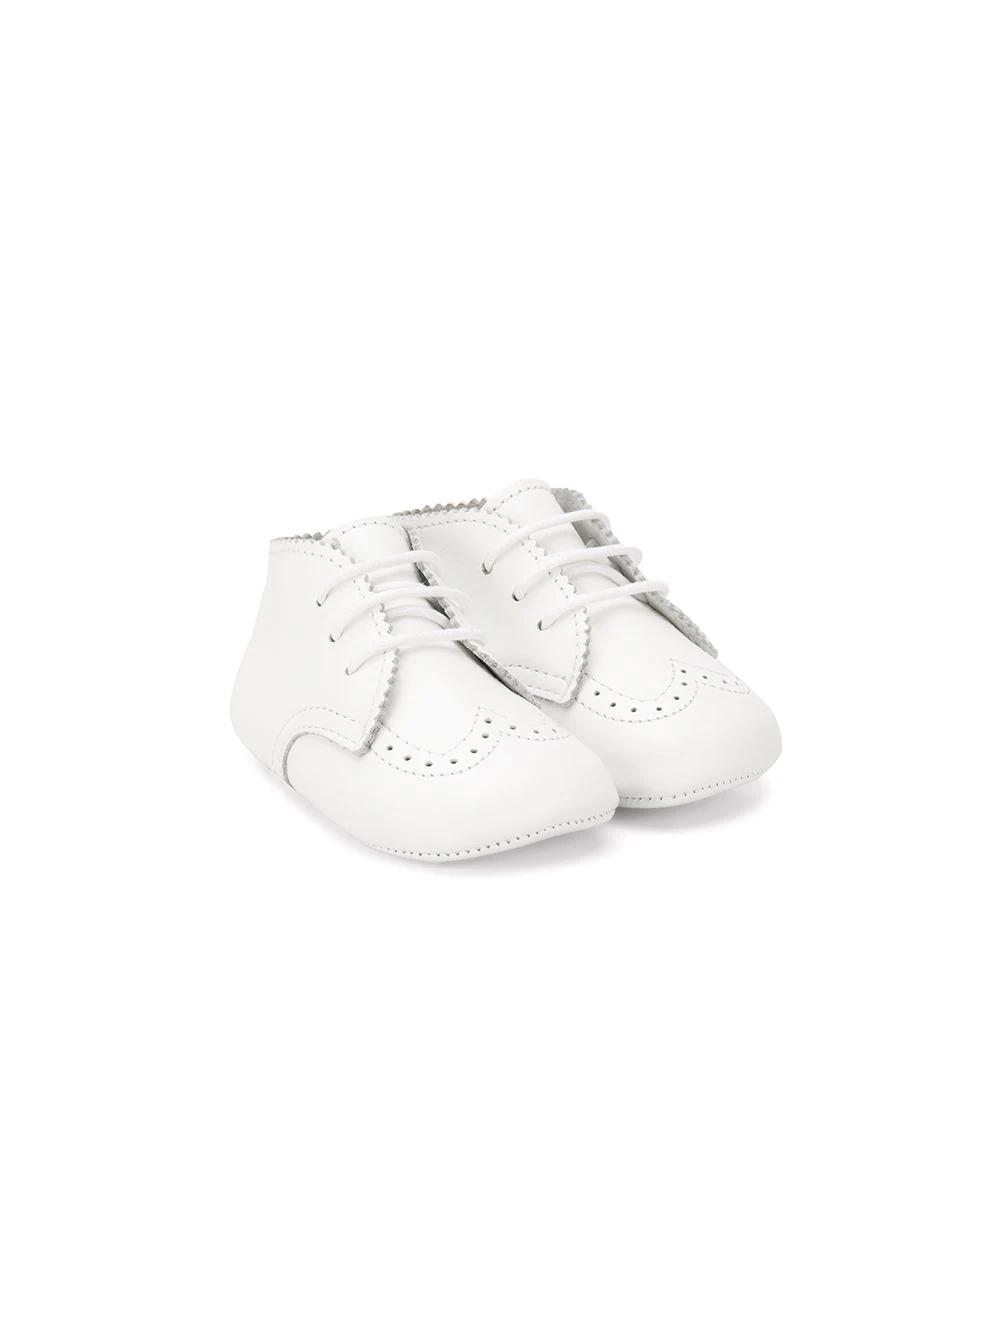 Gallucci Kids | Gallucci Kids ботинки с фестонами | Clouty